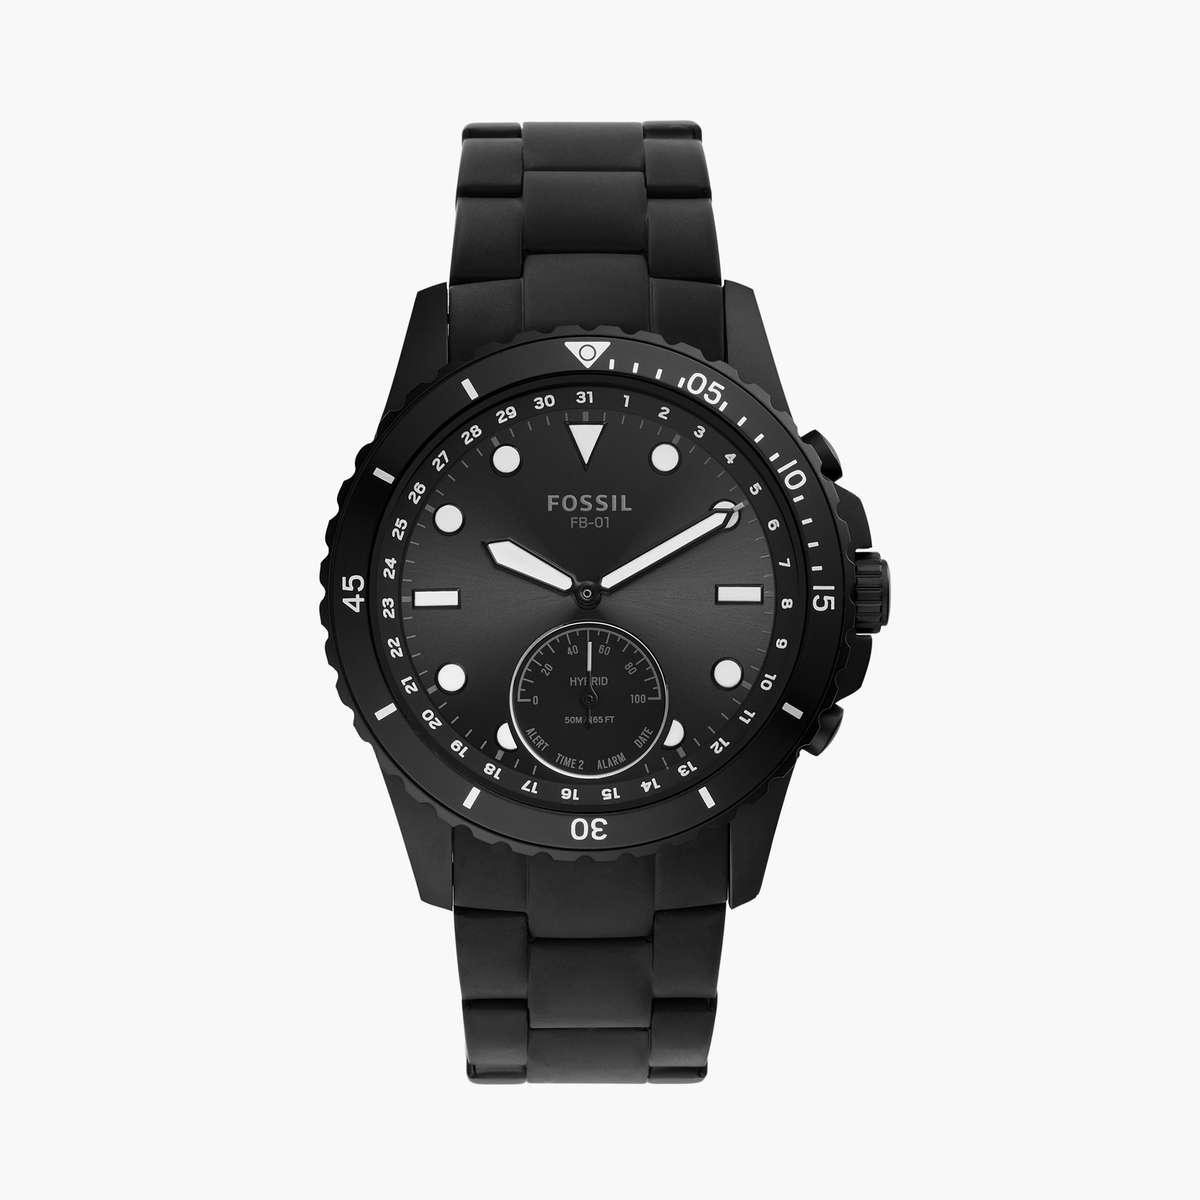 4.FOSSIL Men Hybrid FB-01 Touch Smartwatch- FTW1196